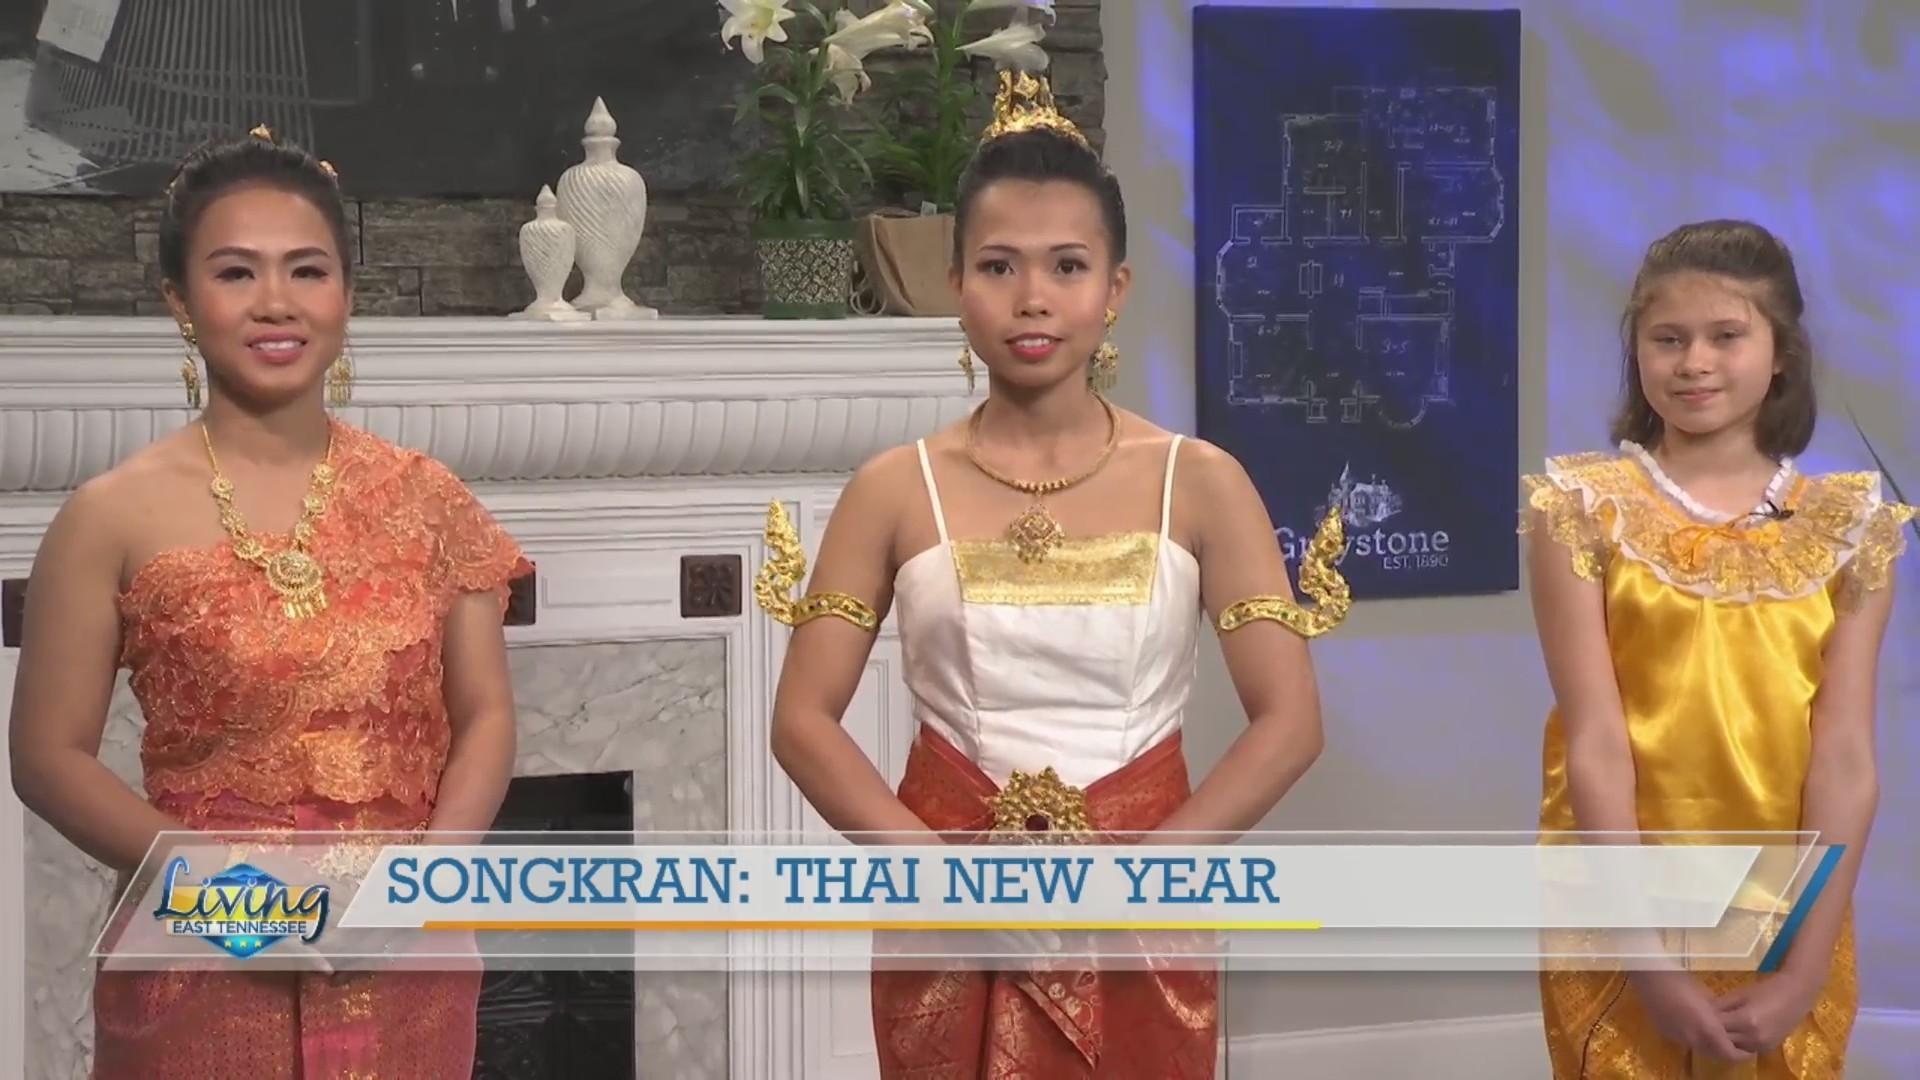 Songkran: Thai New Year